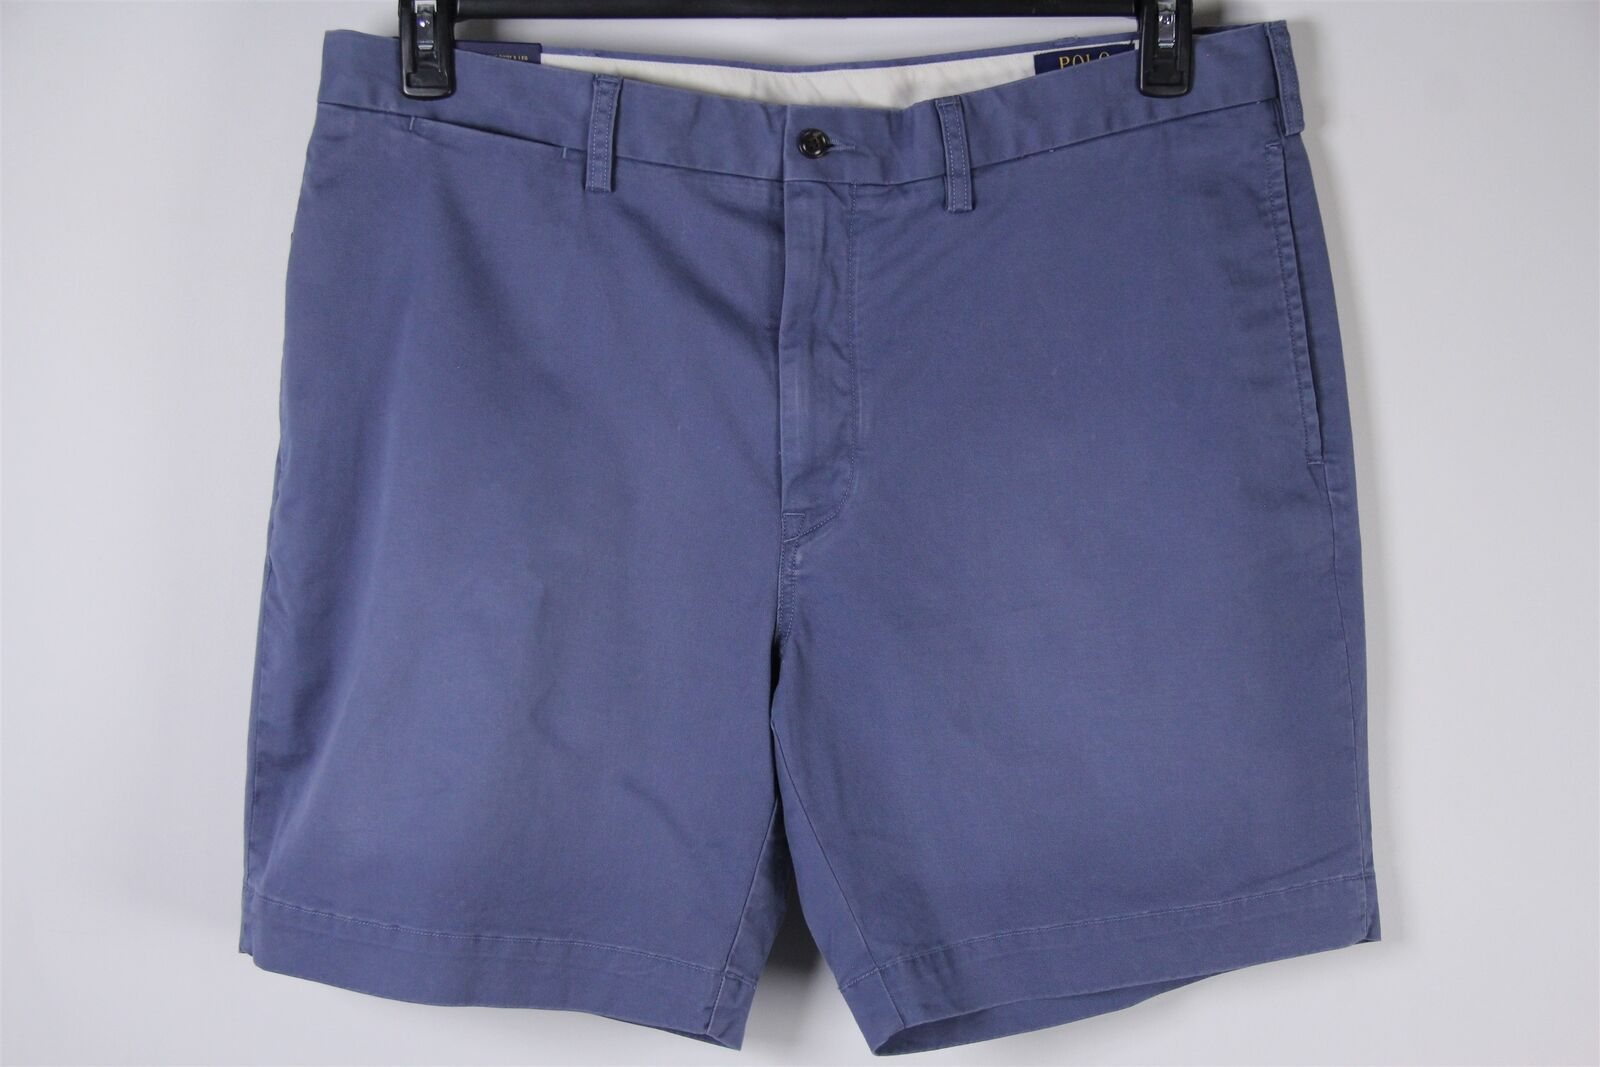 New Polo Ralph Lauren Shorts bluee Classic Fit Stretch Sz 38 Mens